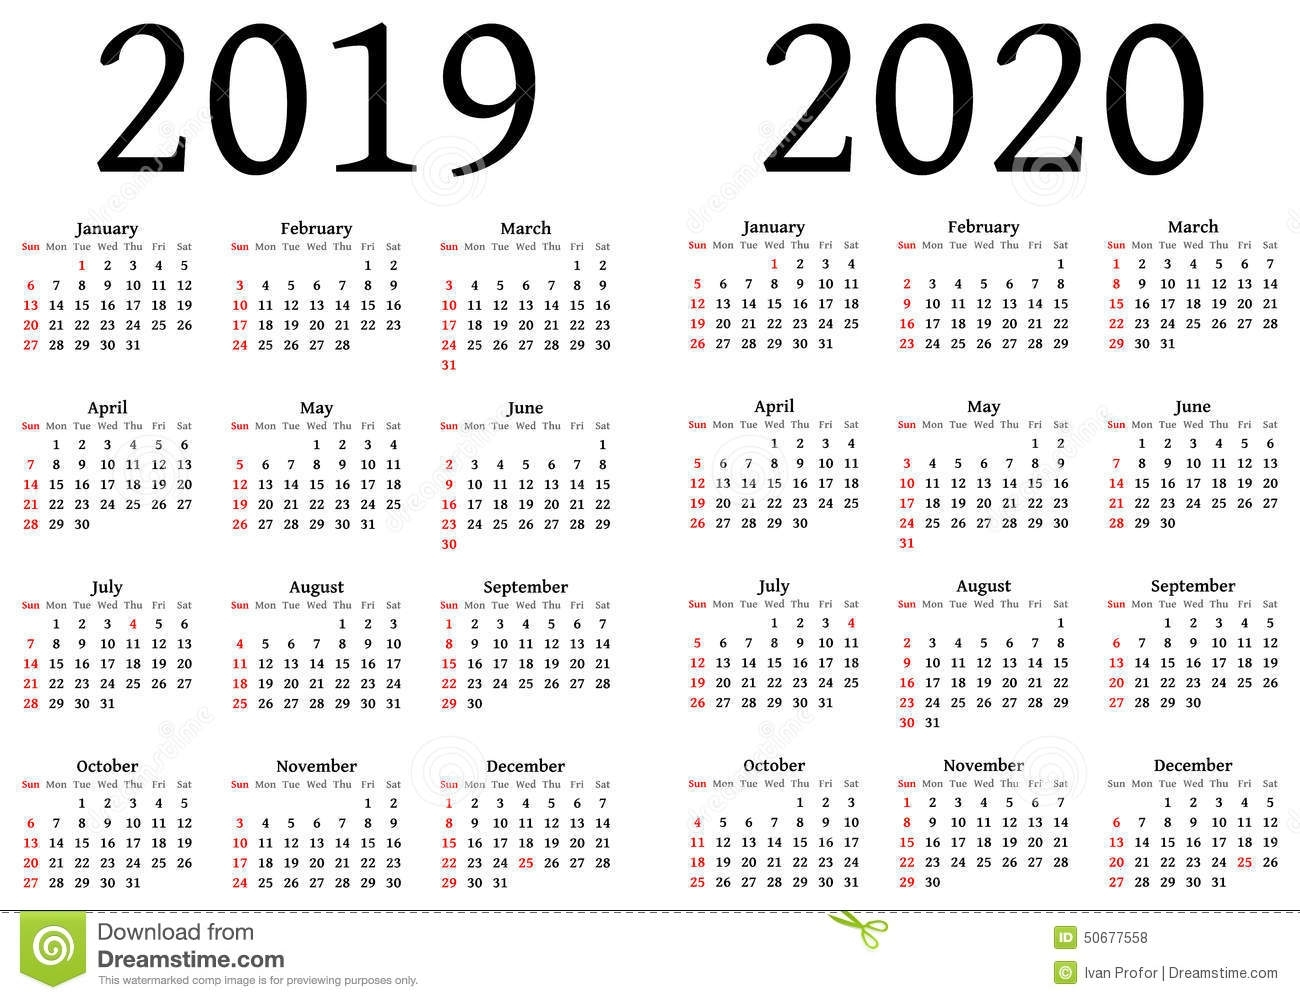 Printable Calendar For 2019 And 2020 | Printable Calendar 2019 with regard to 2019-2020 Large Calandar